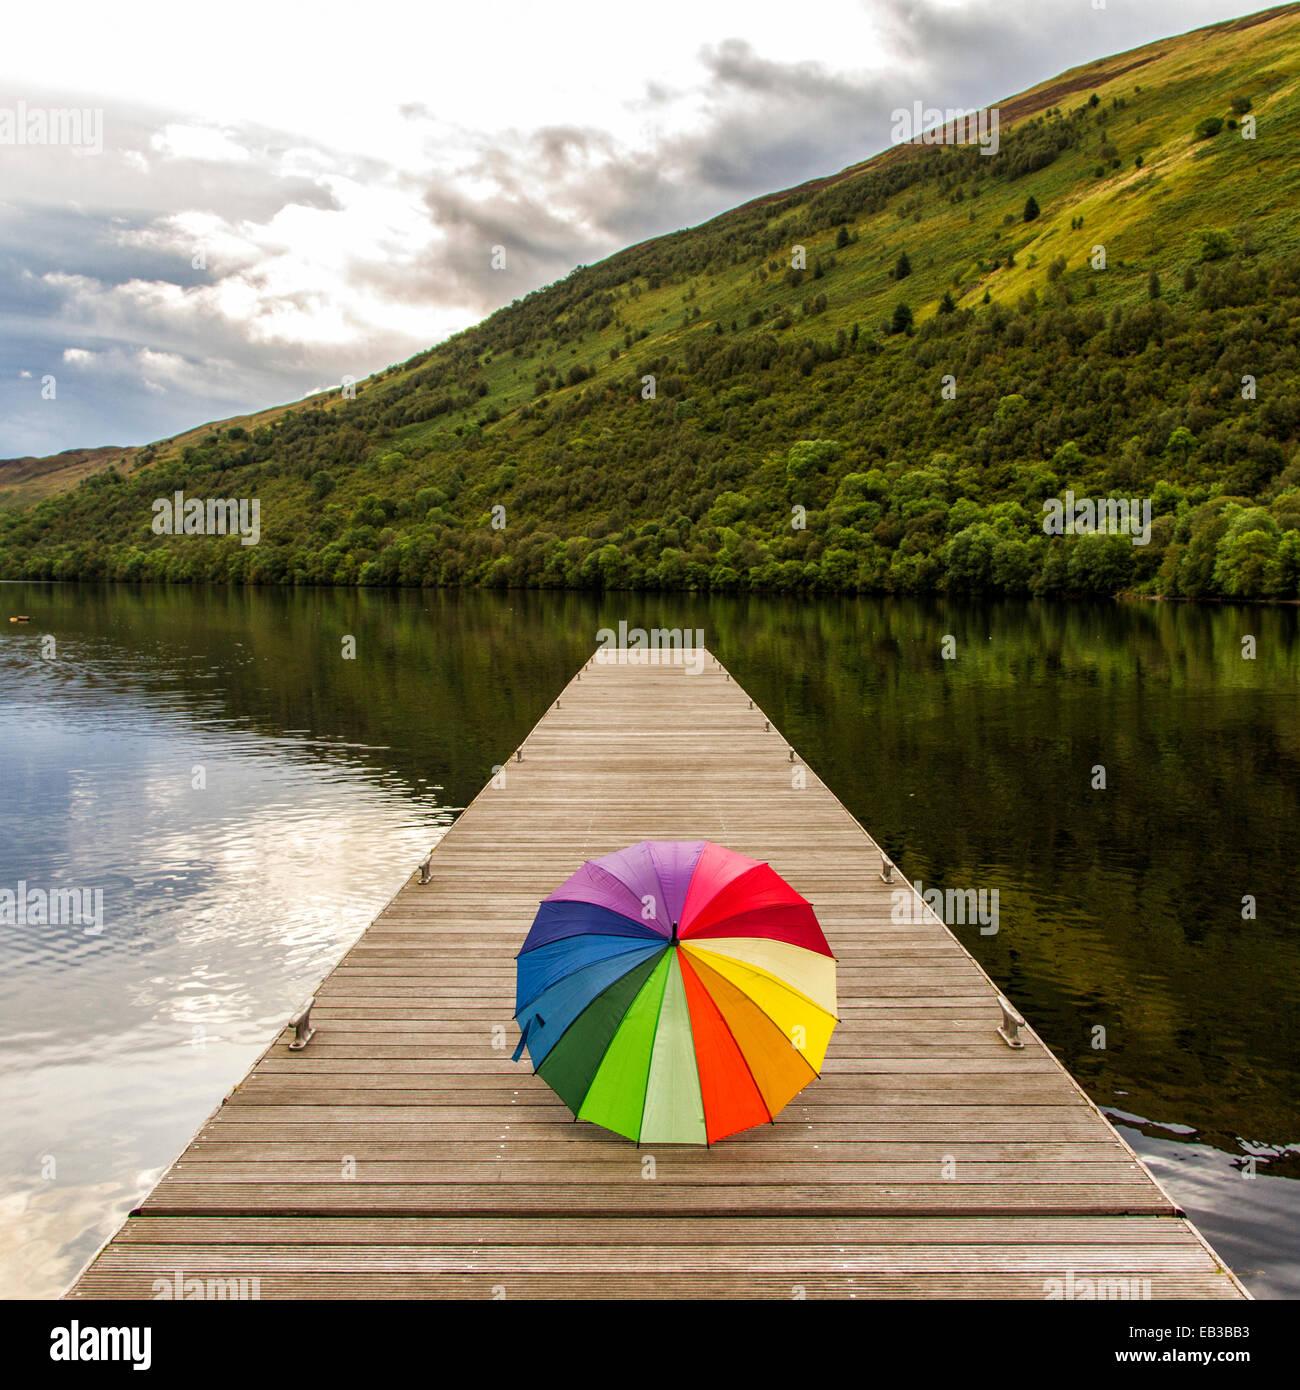 UK, Scotland, Multicolored umbrella on jetty - Stock Image